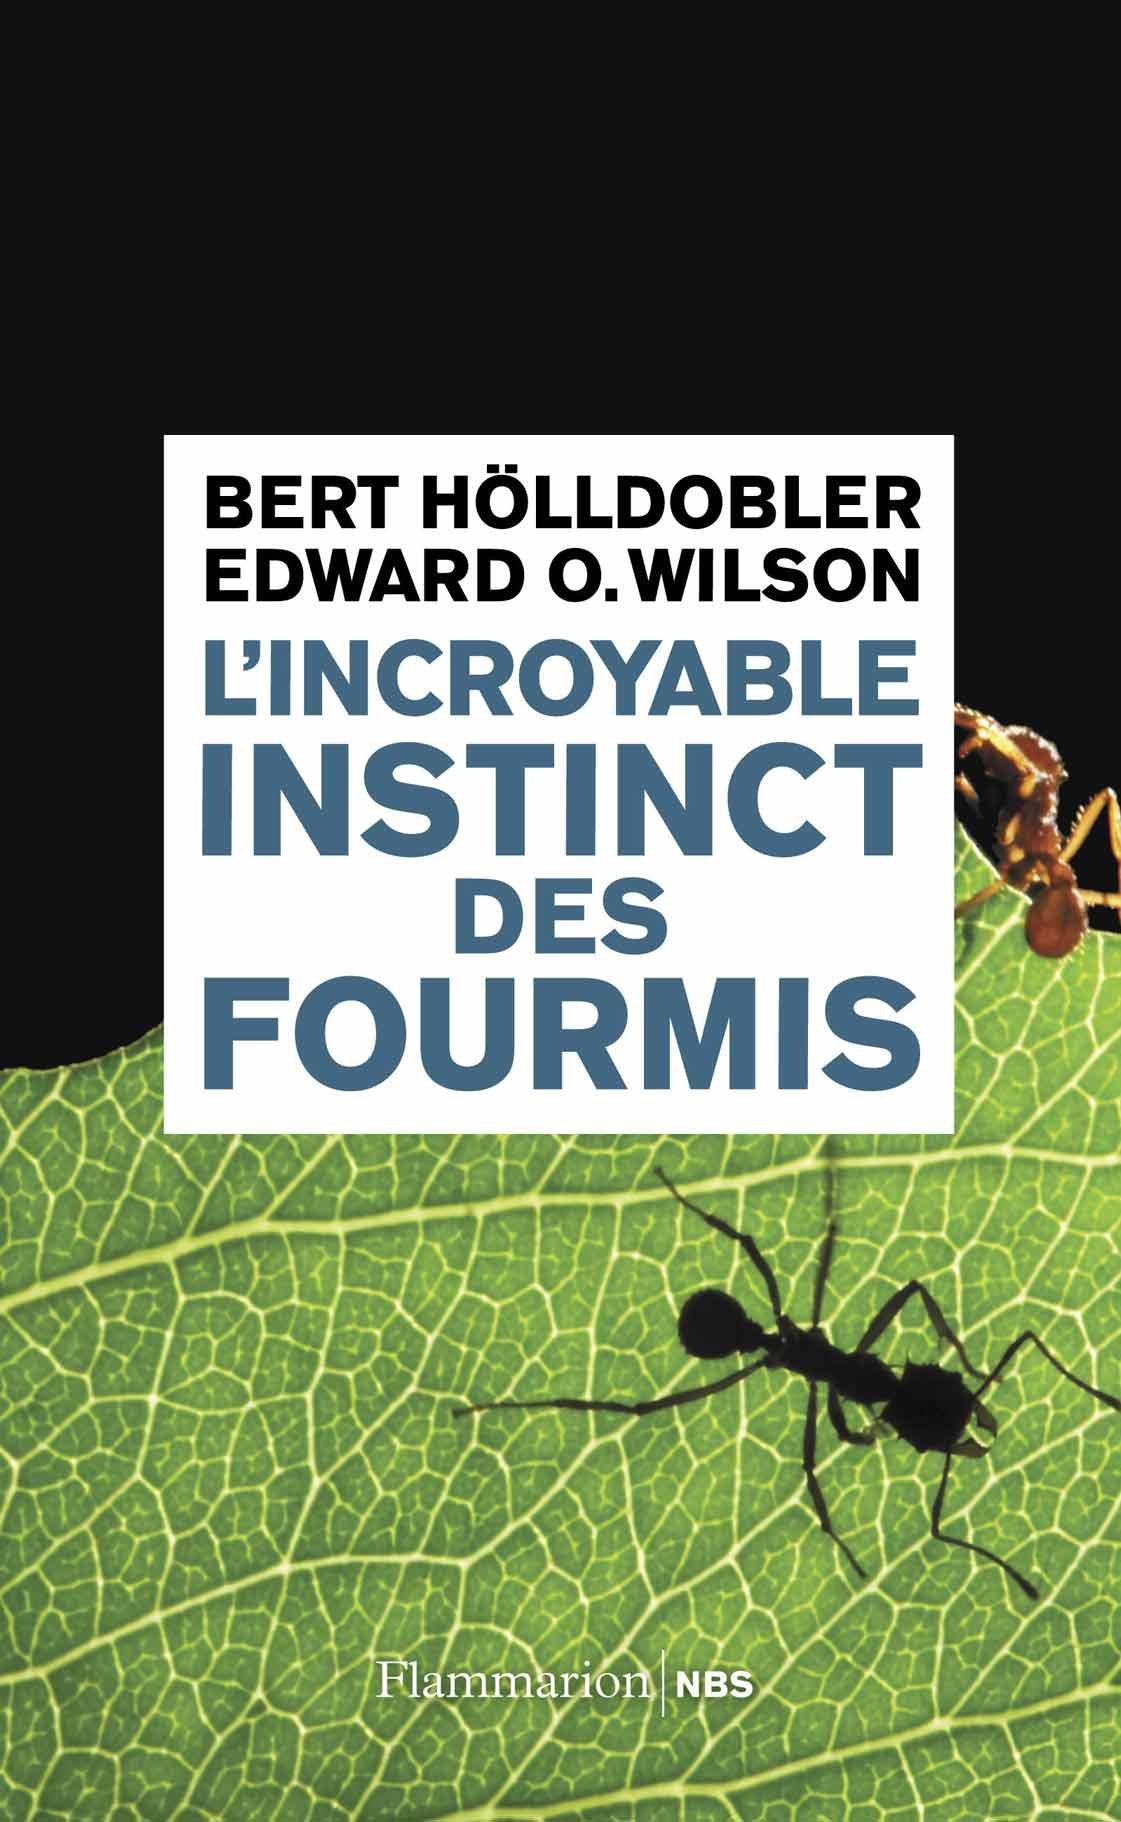 L'incroyable instinct des fourmis - Hölldobler & Wilson